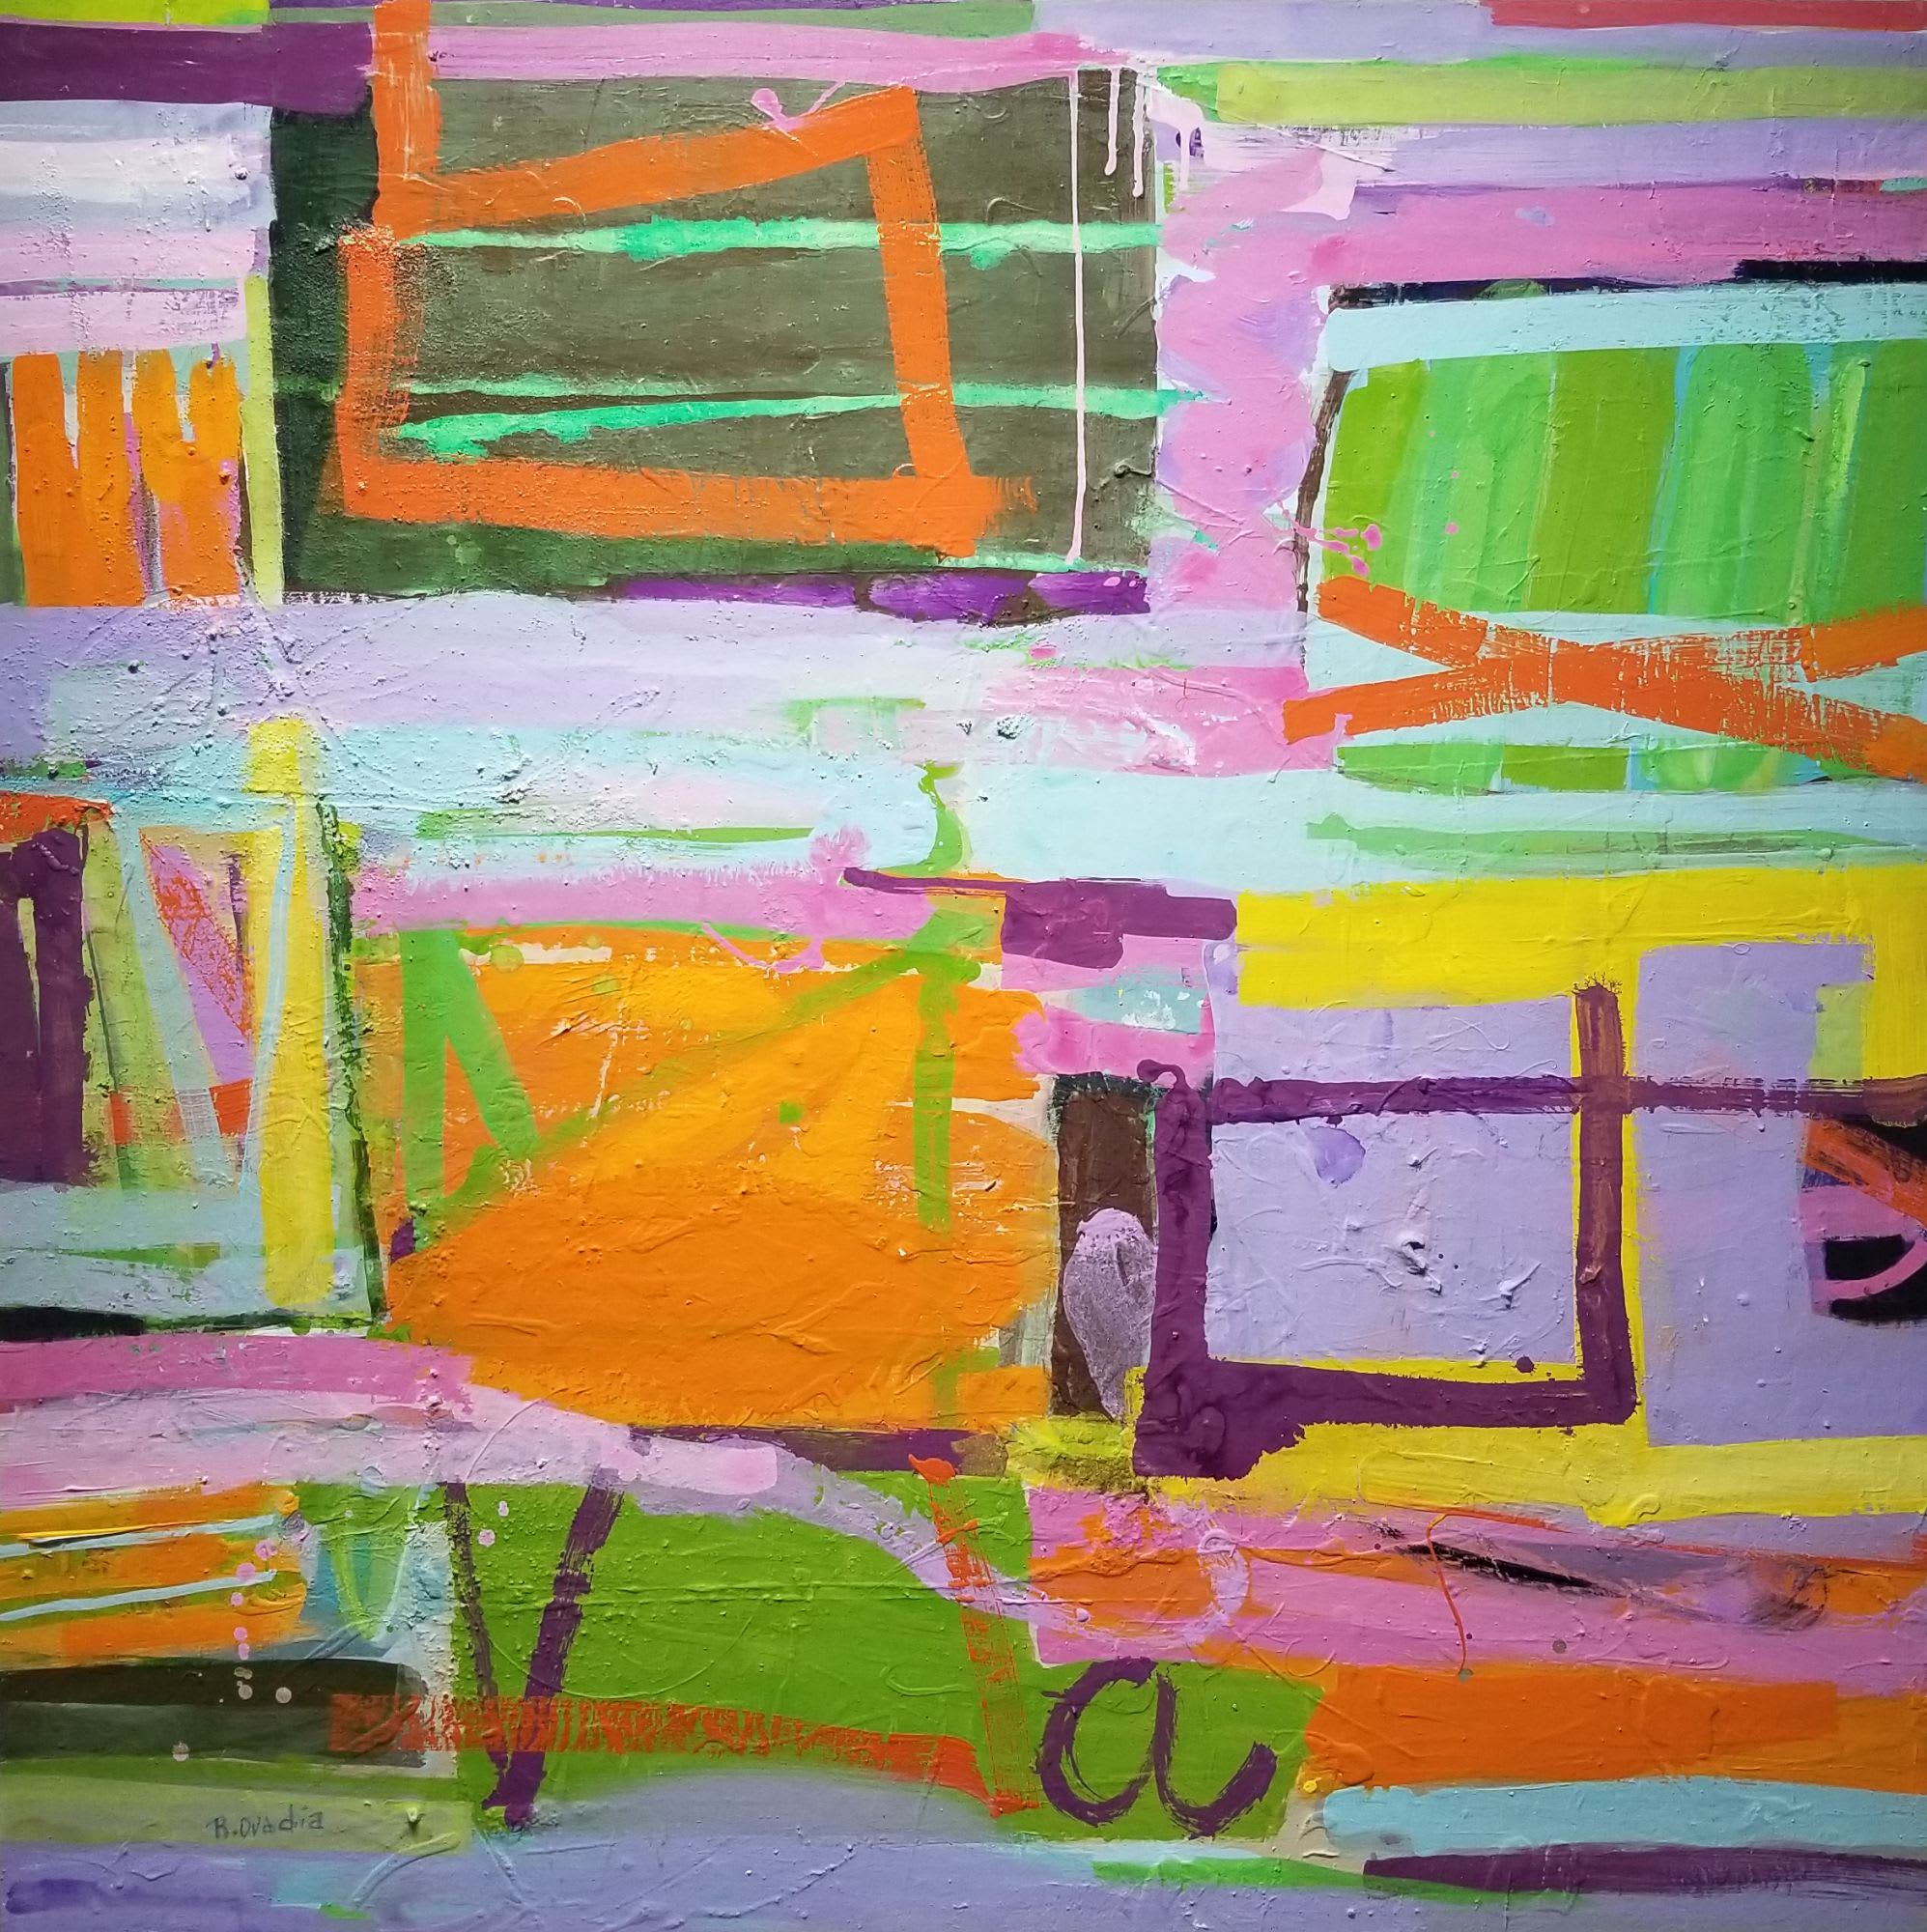 'Crossing The Bridge II' by Rachel Ovadia at Gallery 133